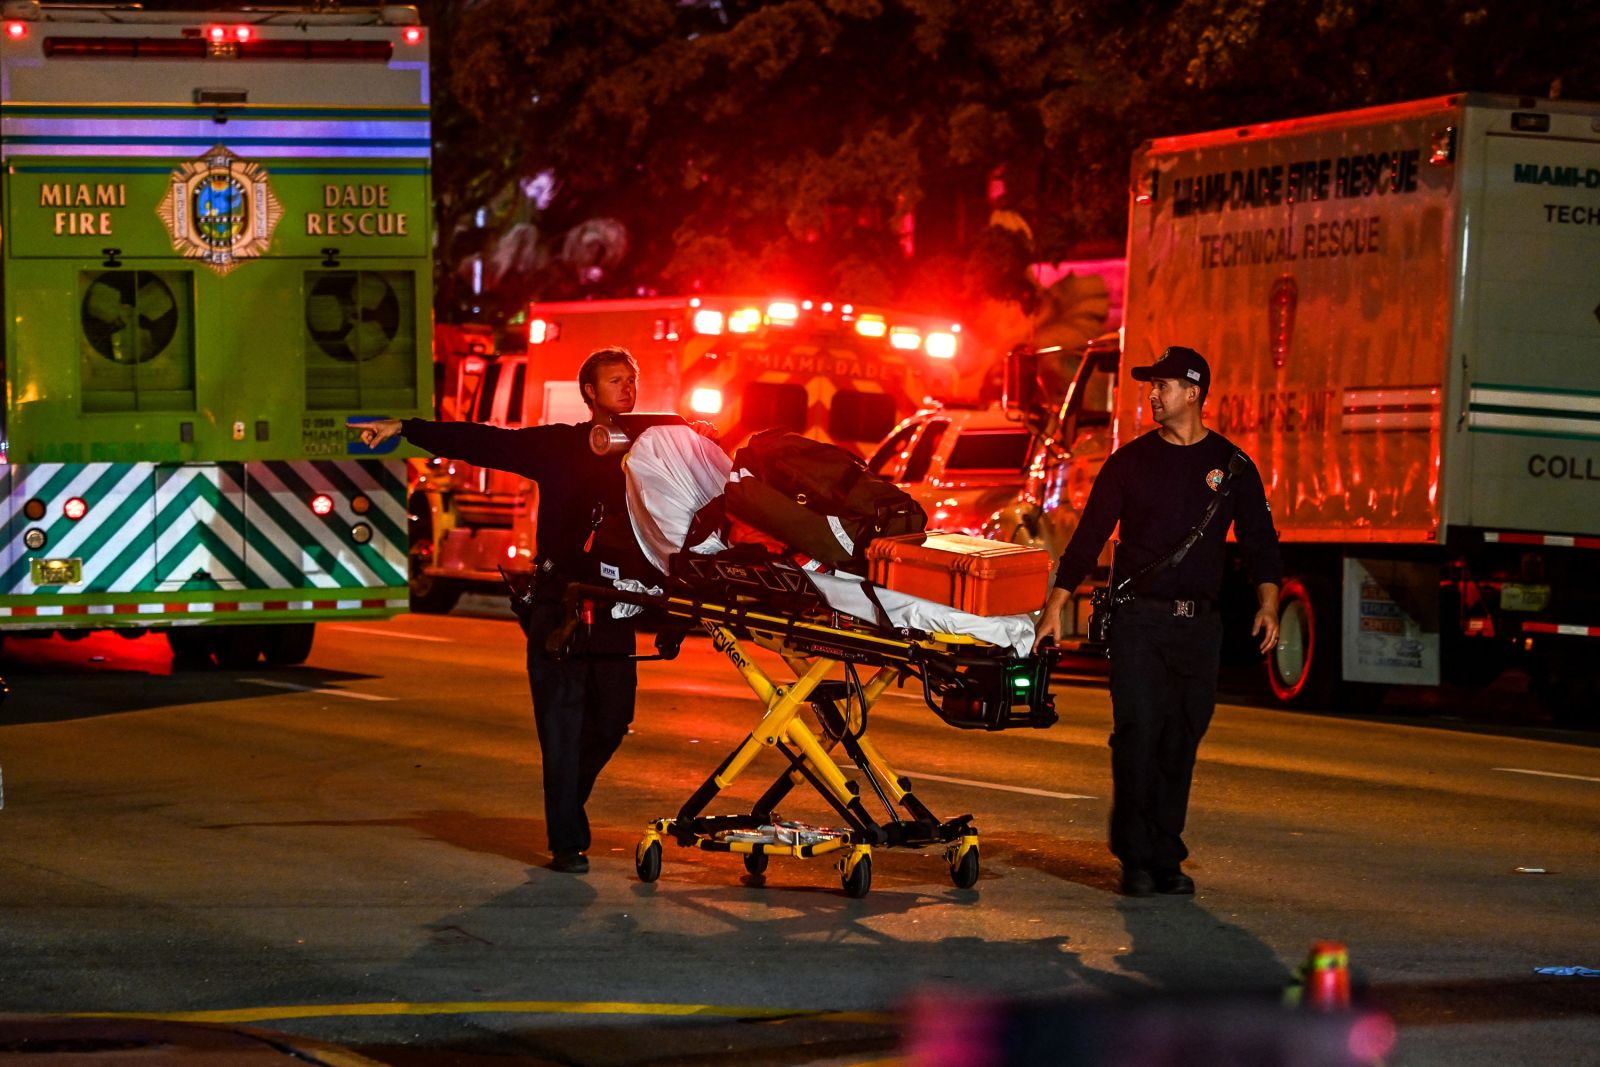 More than 80 rescue units responded to the scene at 8777 Collins Avenue, Miami-Dade Fire Rescue said.